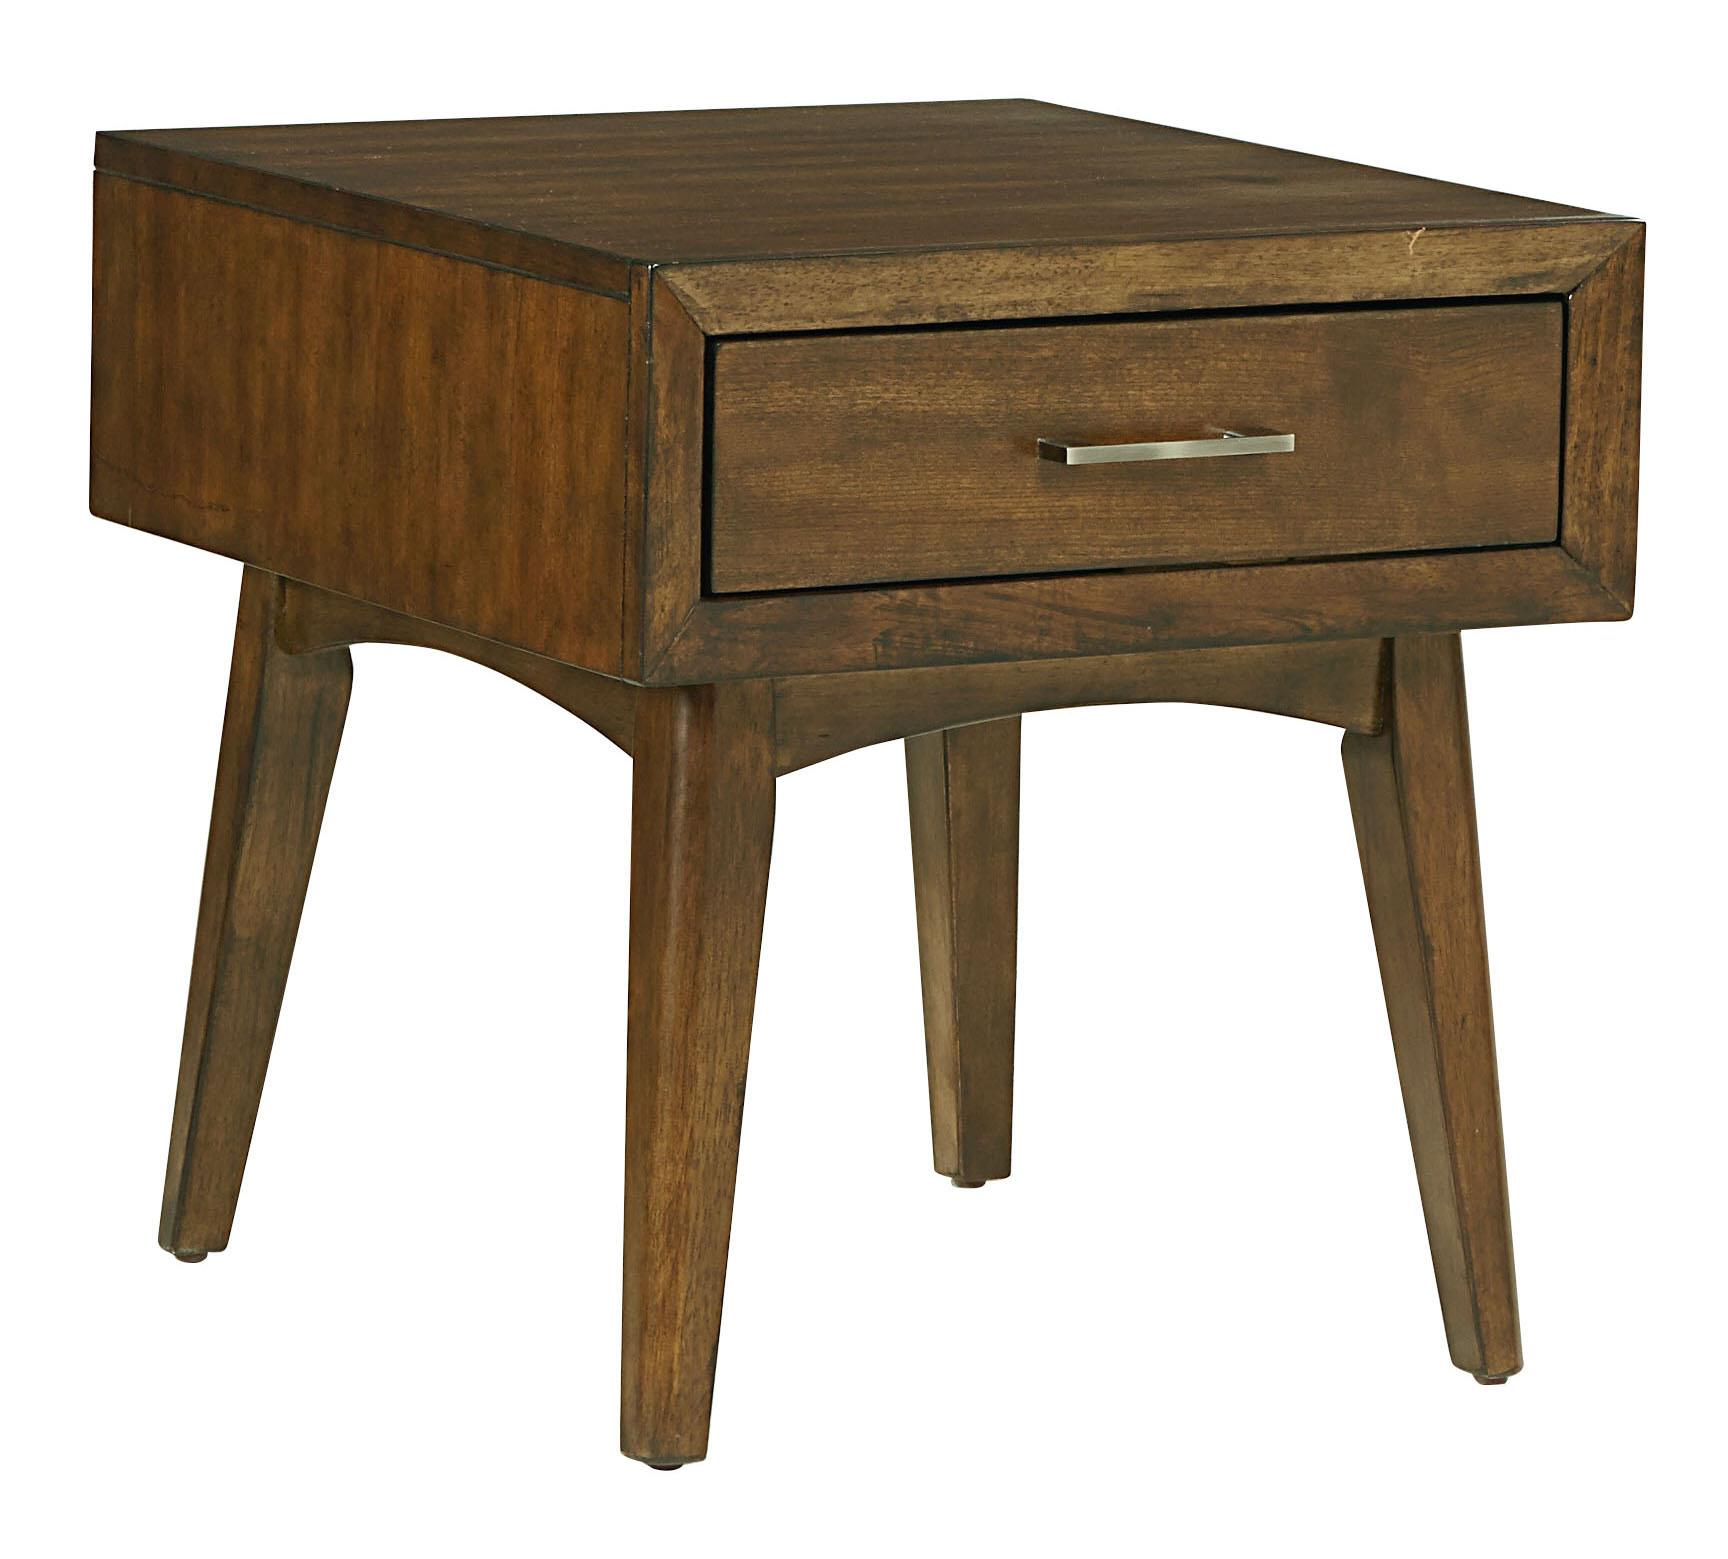 Standard Furniture Roxbury Mid Century Modern 1 Drawer End